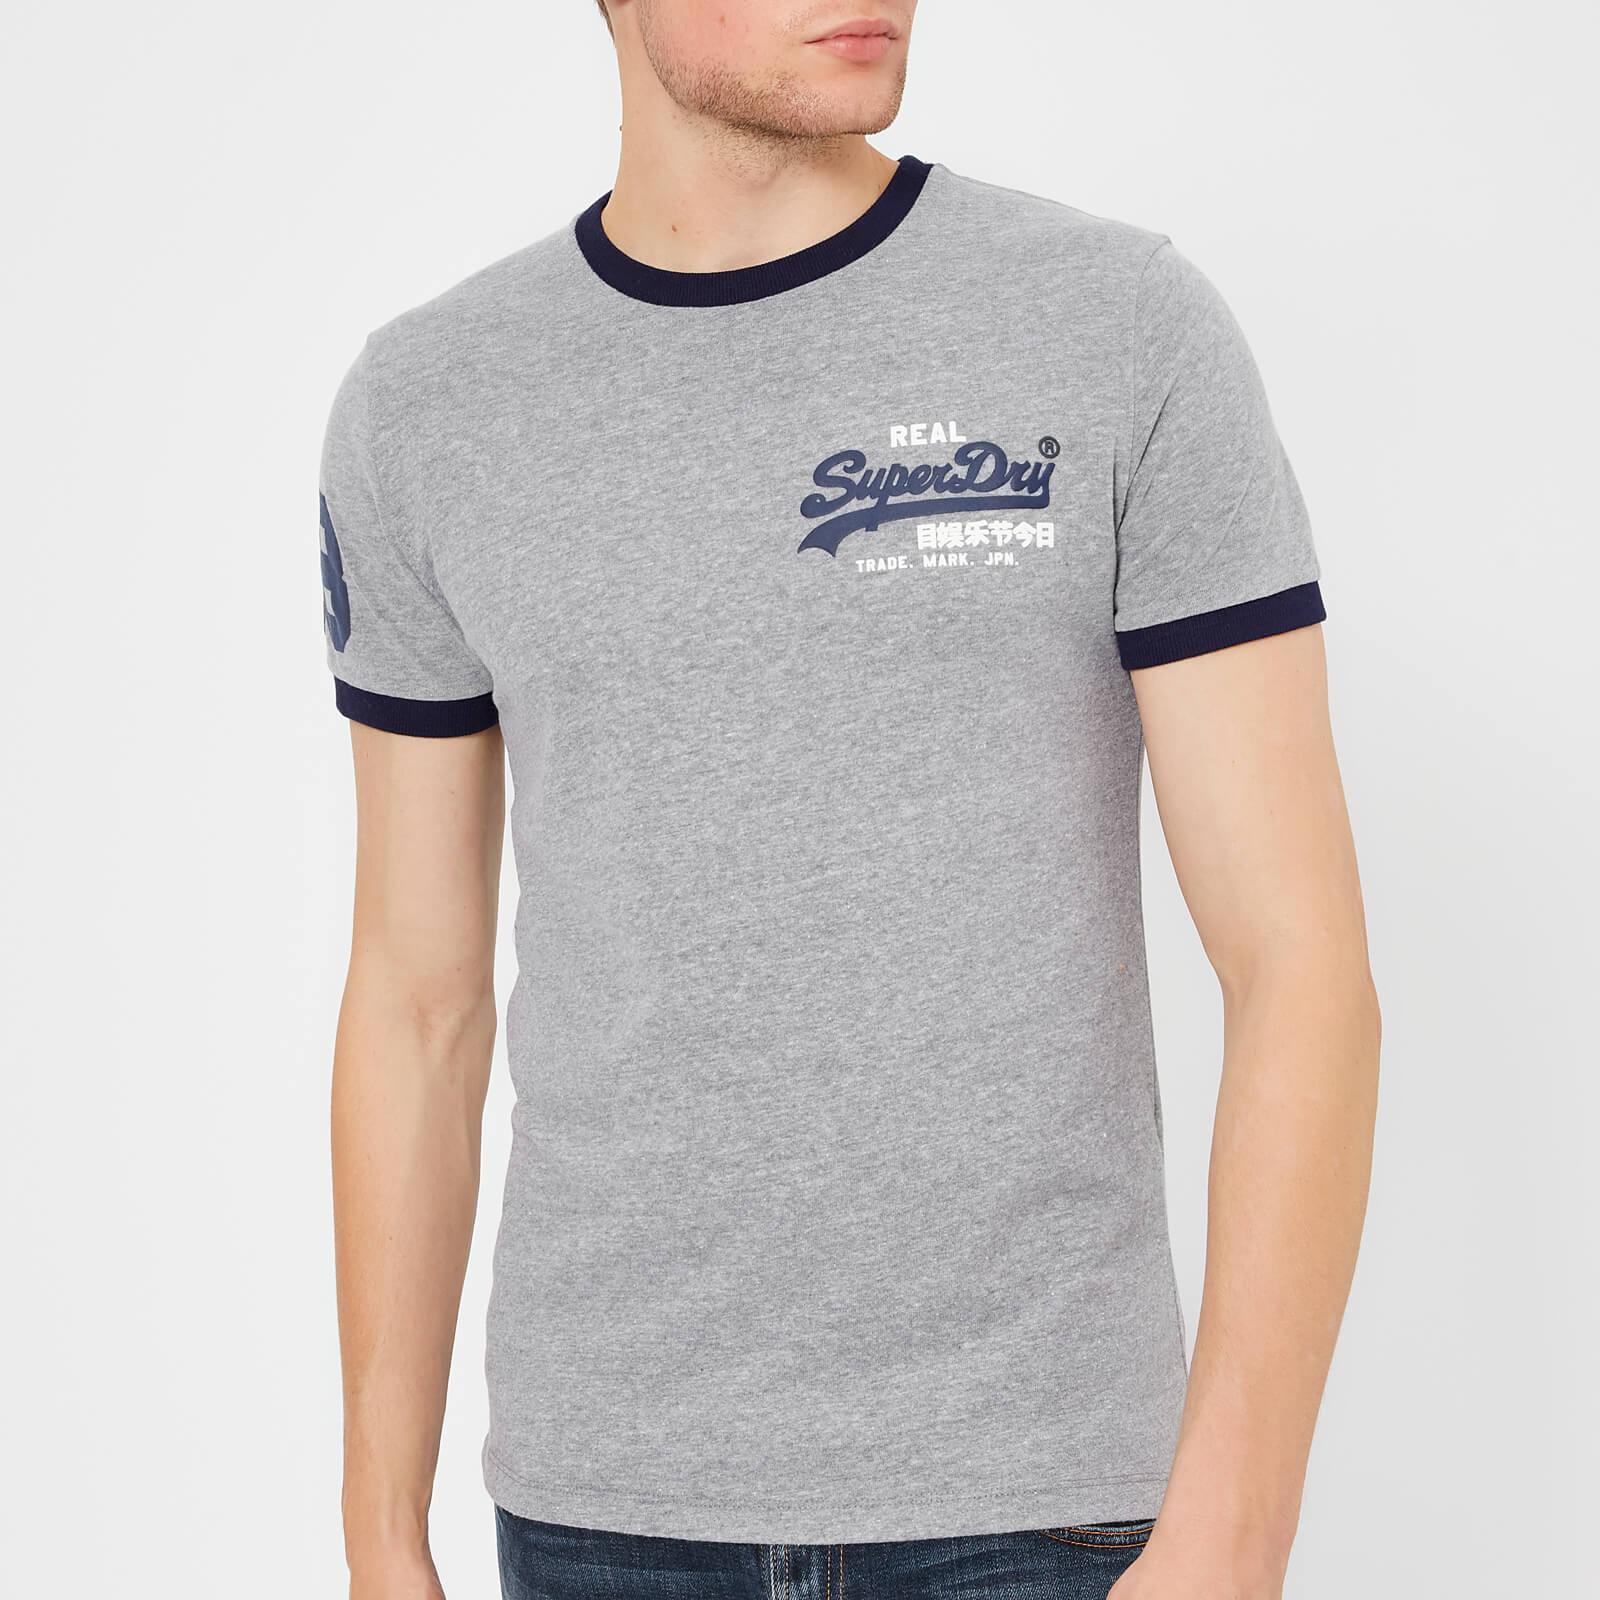 82e9ea84 Superdry Men's Vintage Logo Ringer T-Shirt - Blizzard Grey Marl Clothing |  TheHut.com